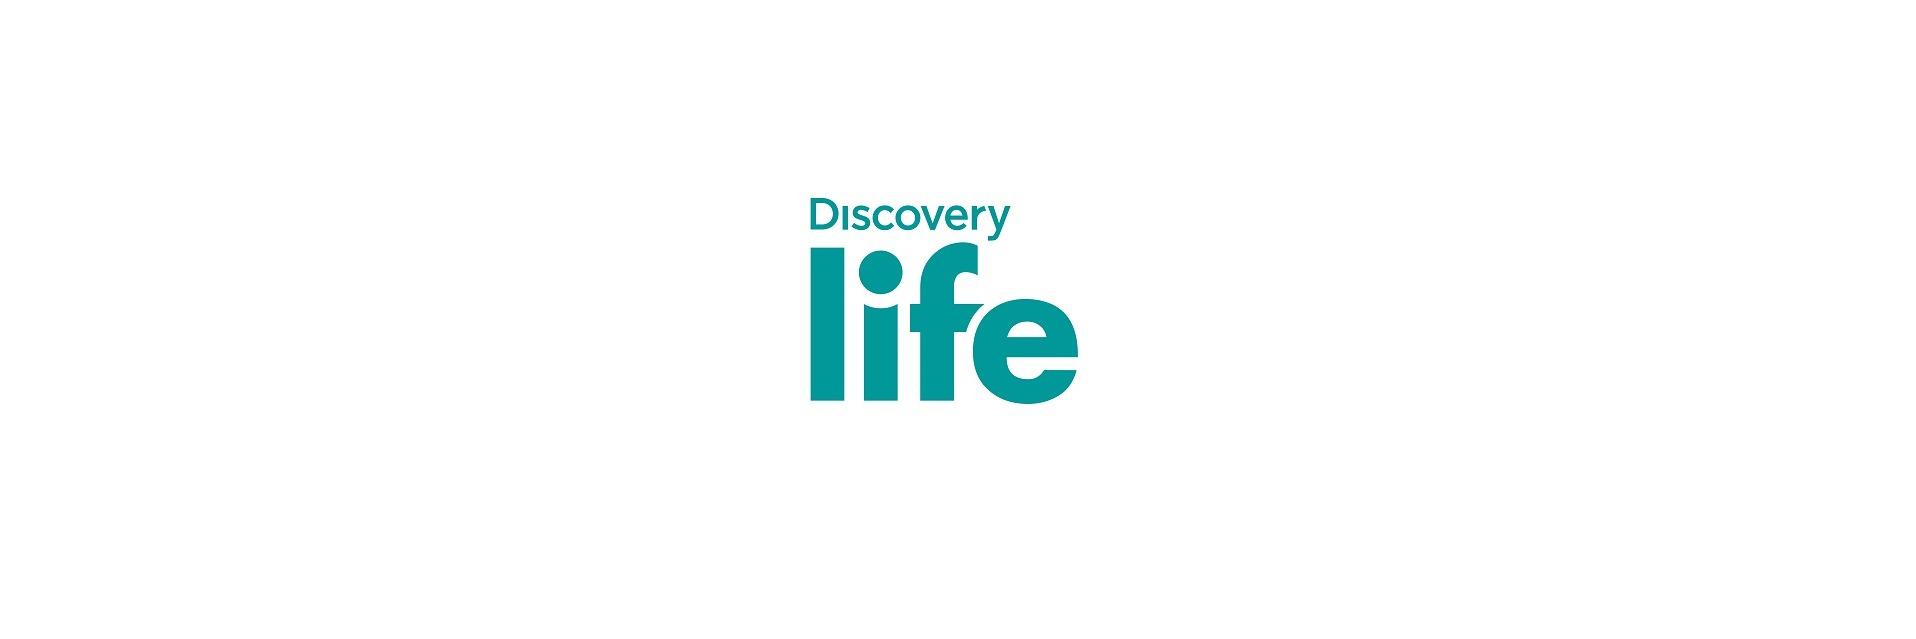 Ramówka Discovery Life